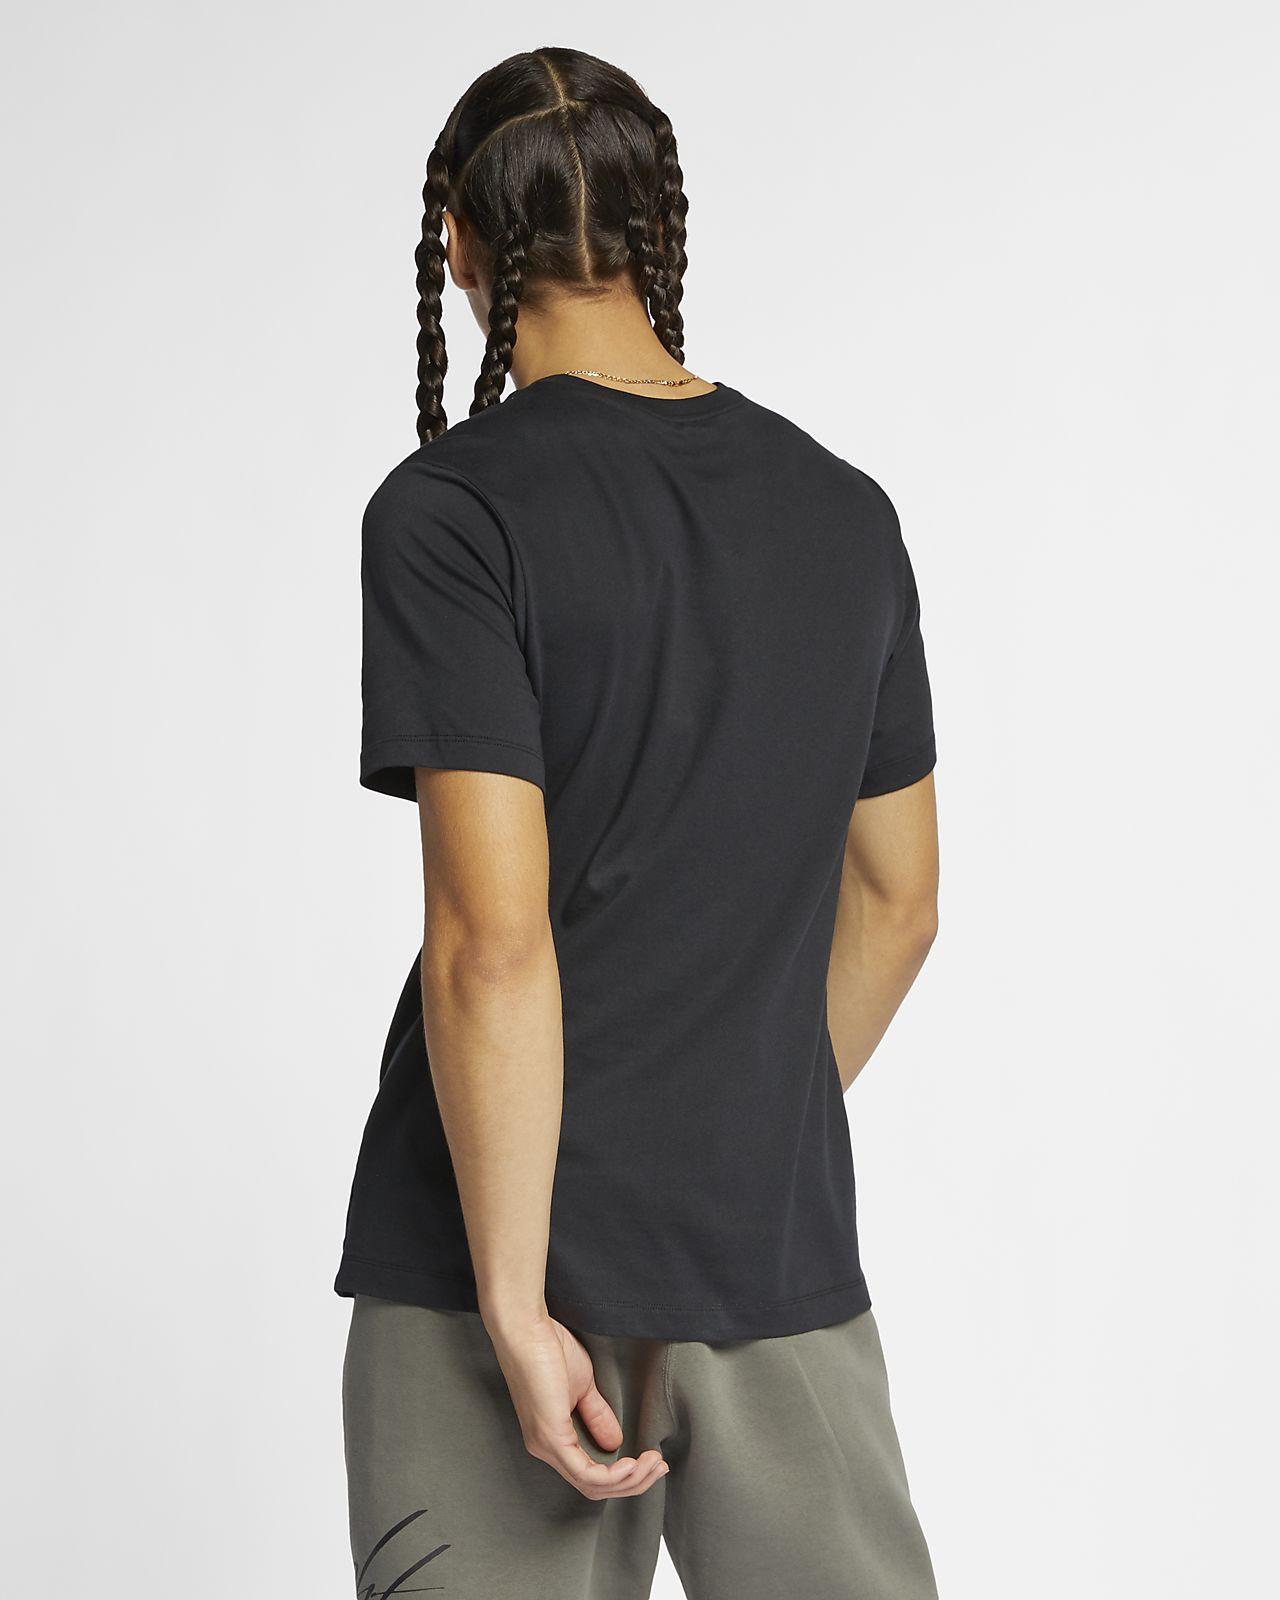 167de6e345b8 Jordan Jumpman Flight Men s T-Shirt. Nike.com